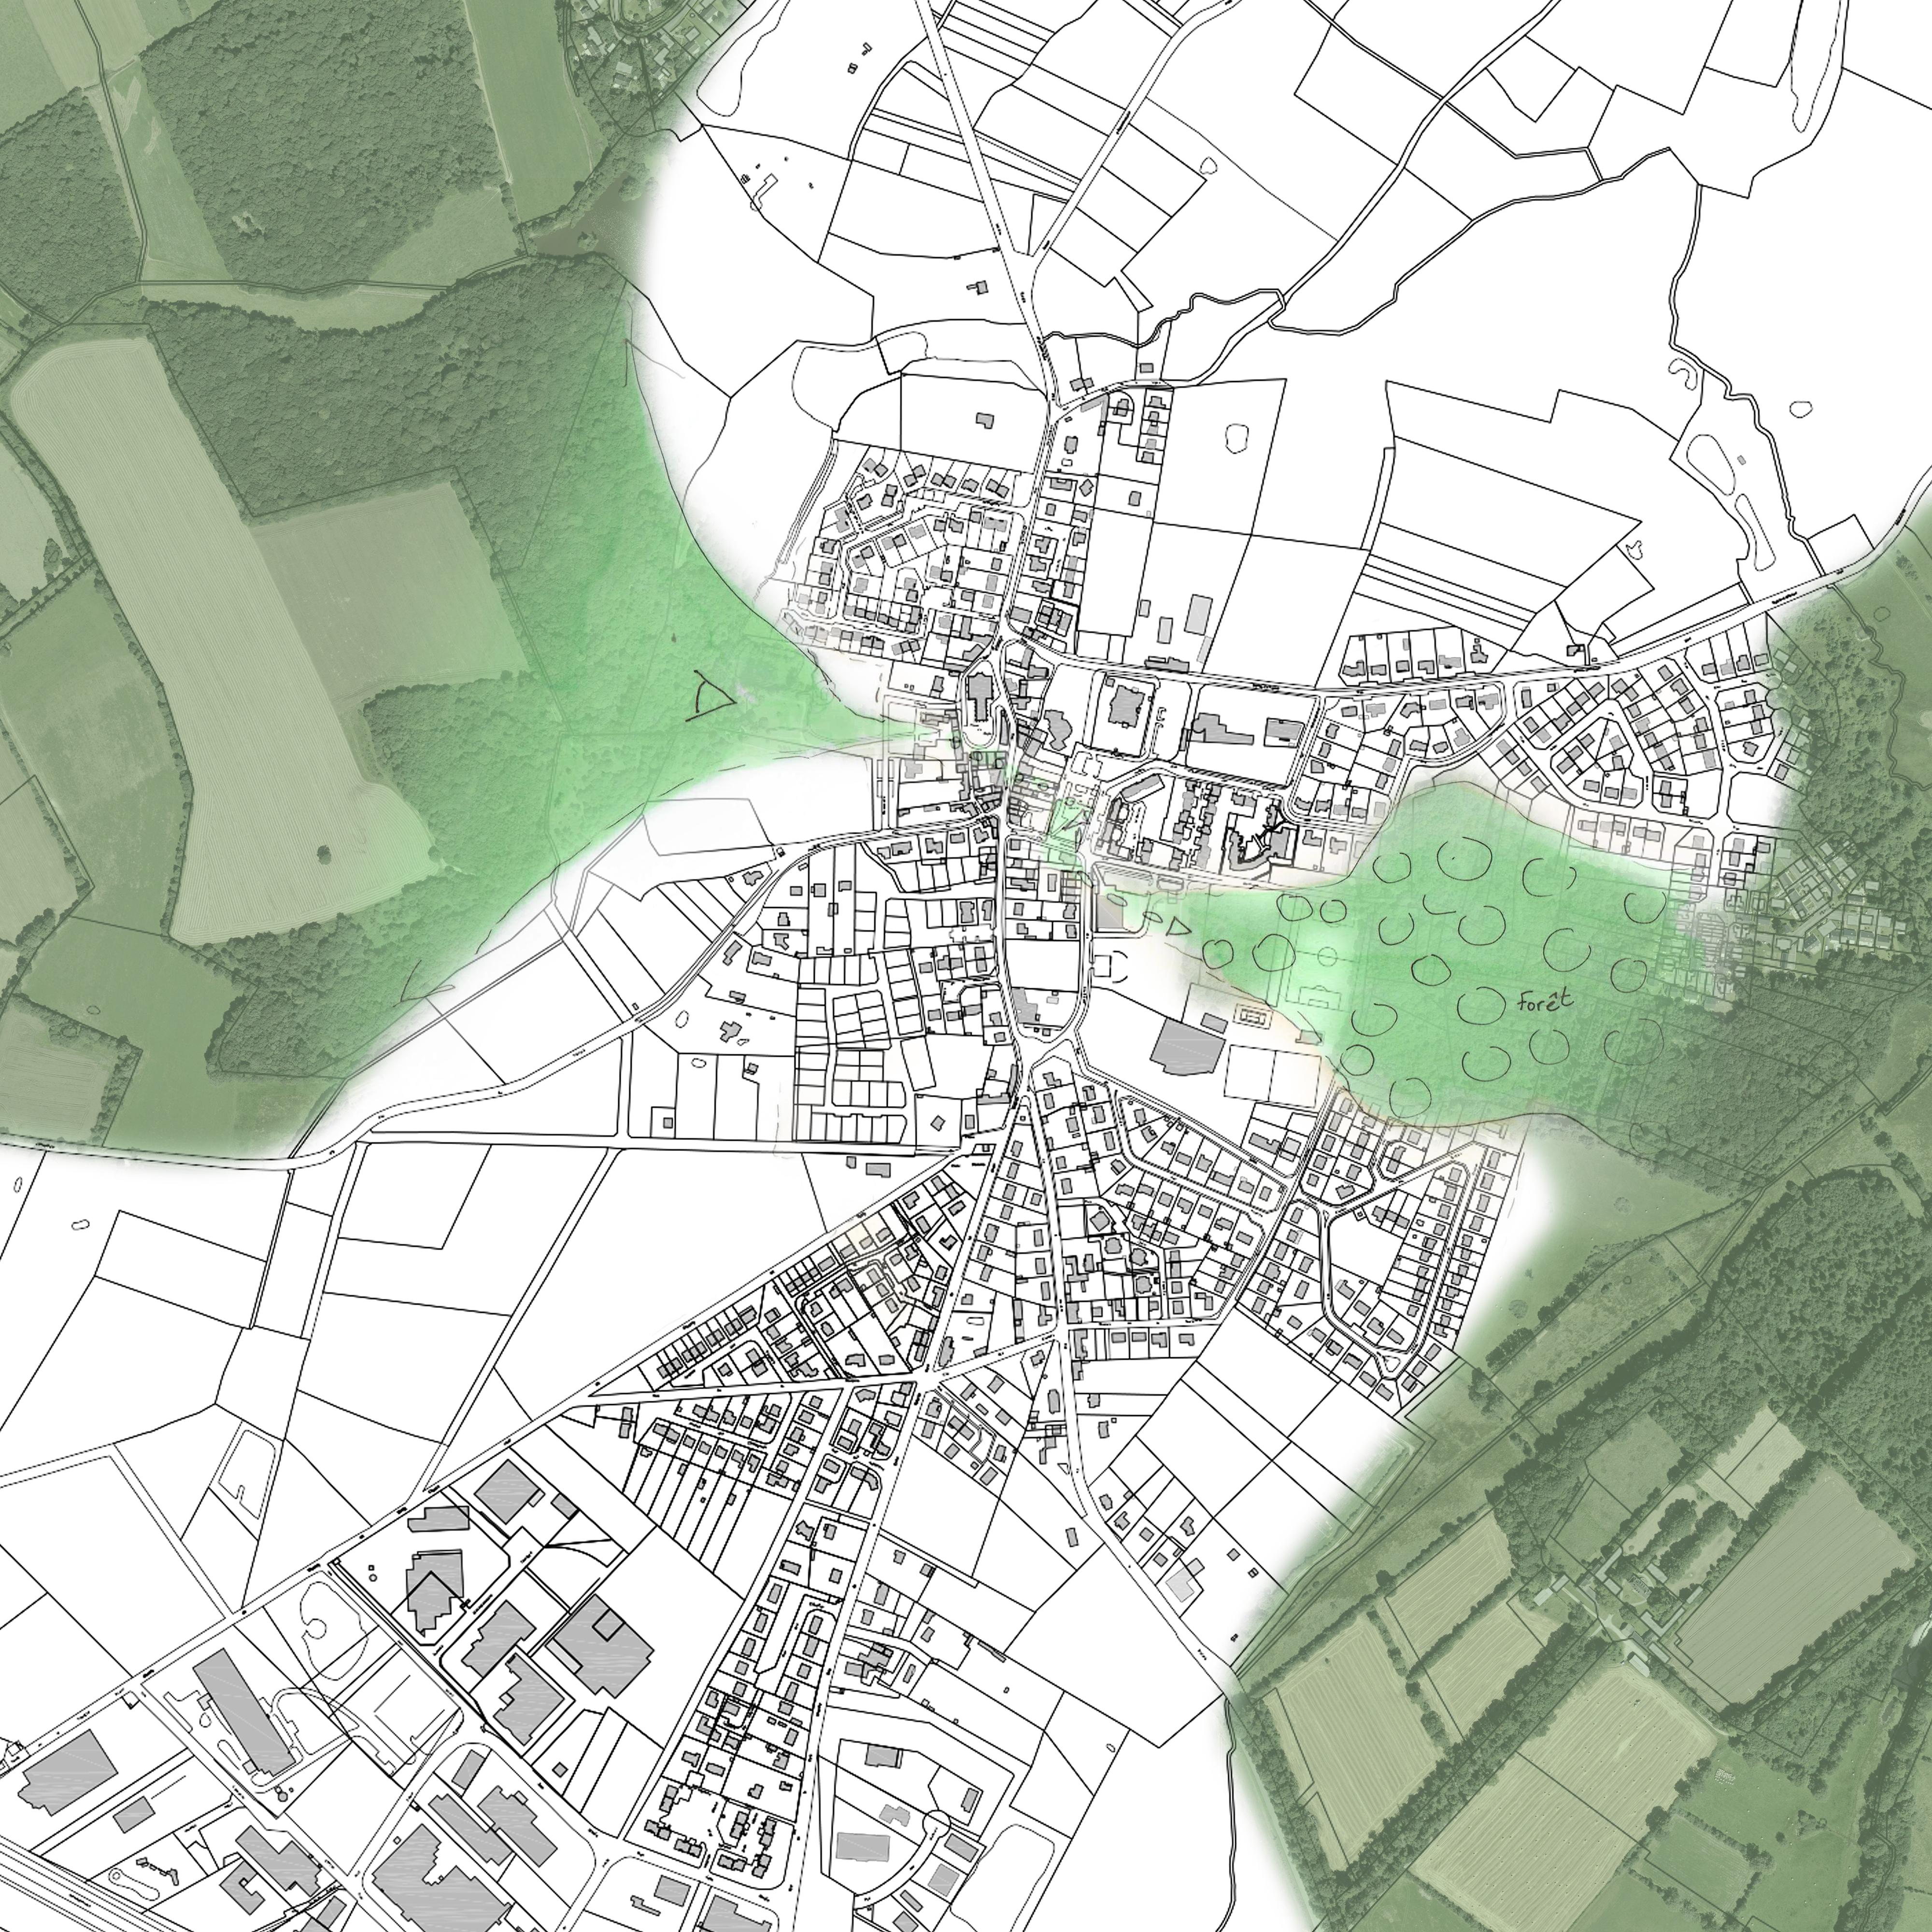 KOGI-Malville_-_schéma_territoire_forêt.